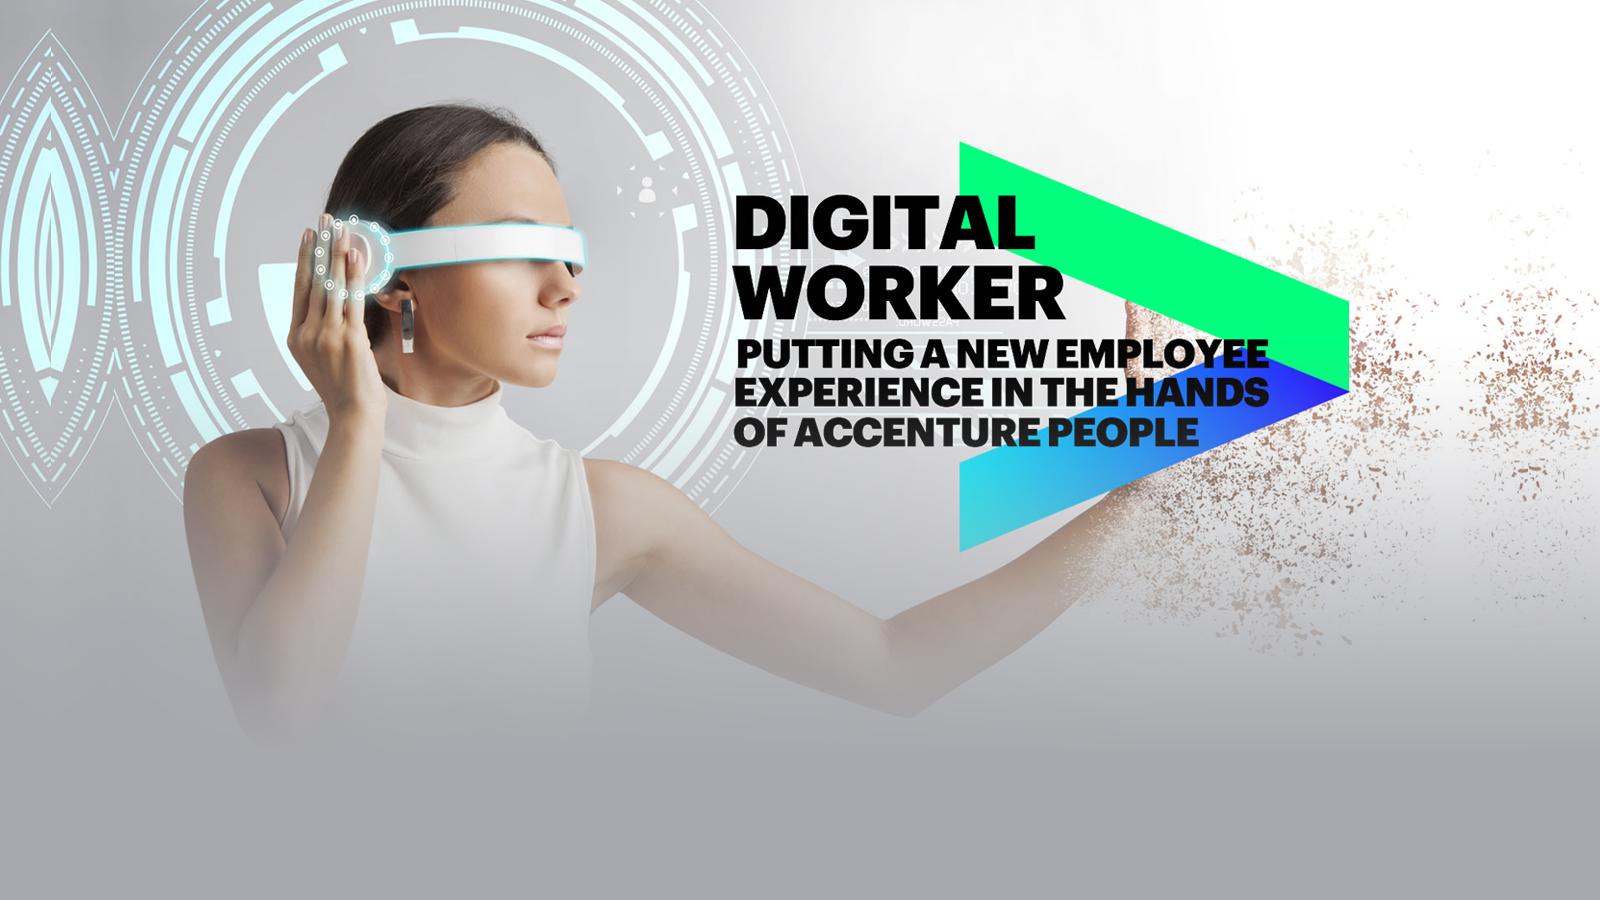 digital worker new employee experience accenture